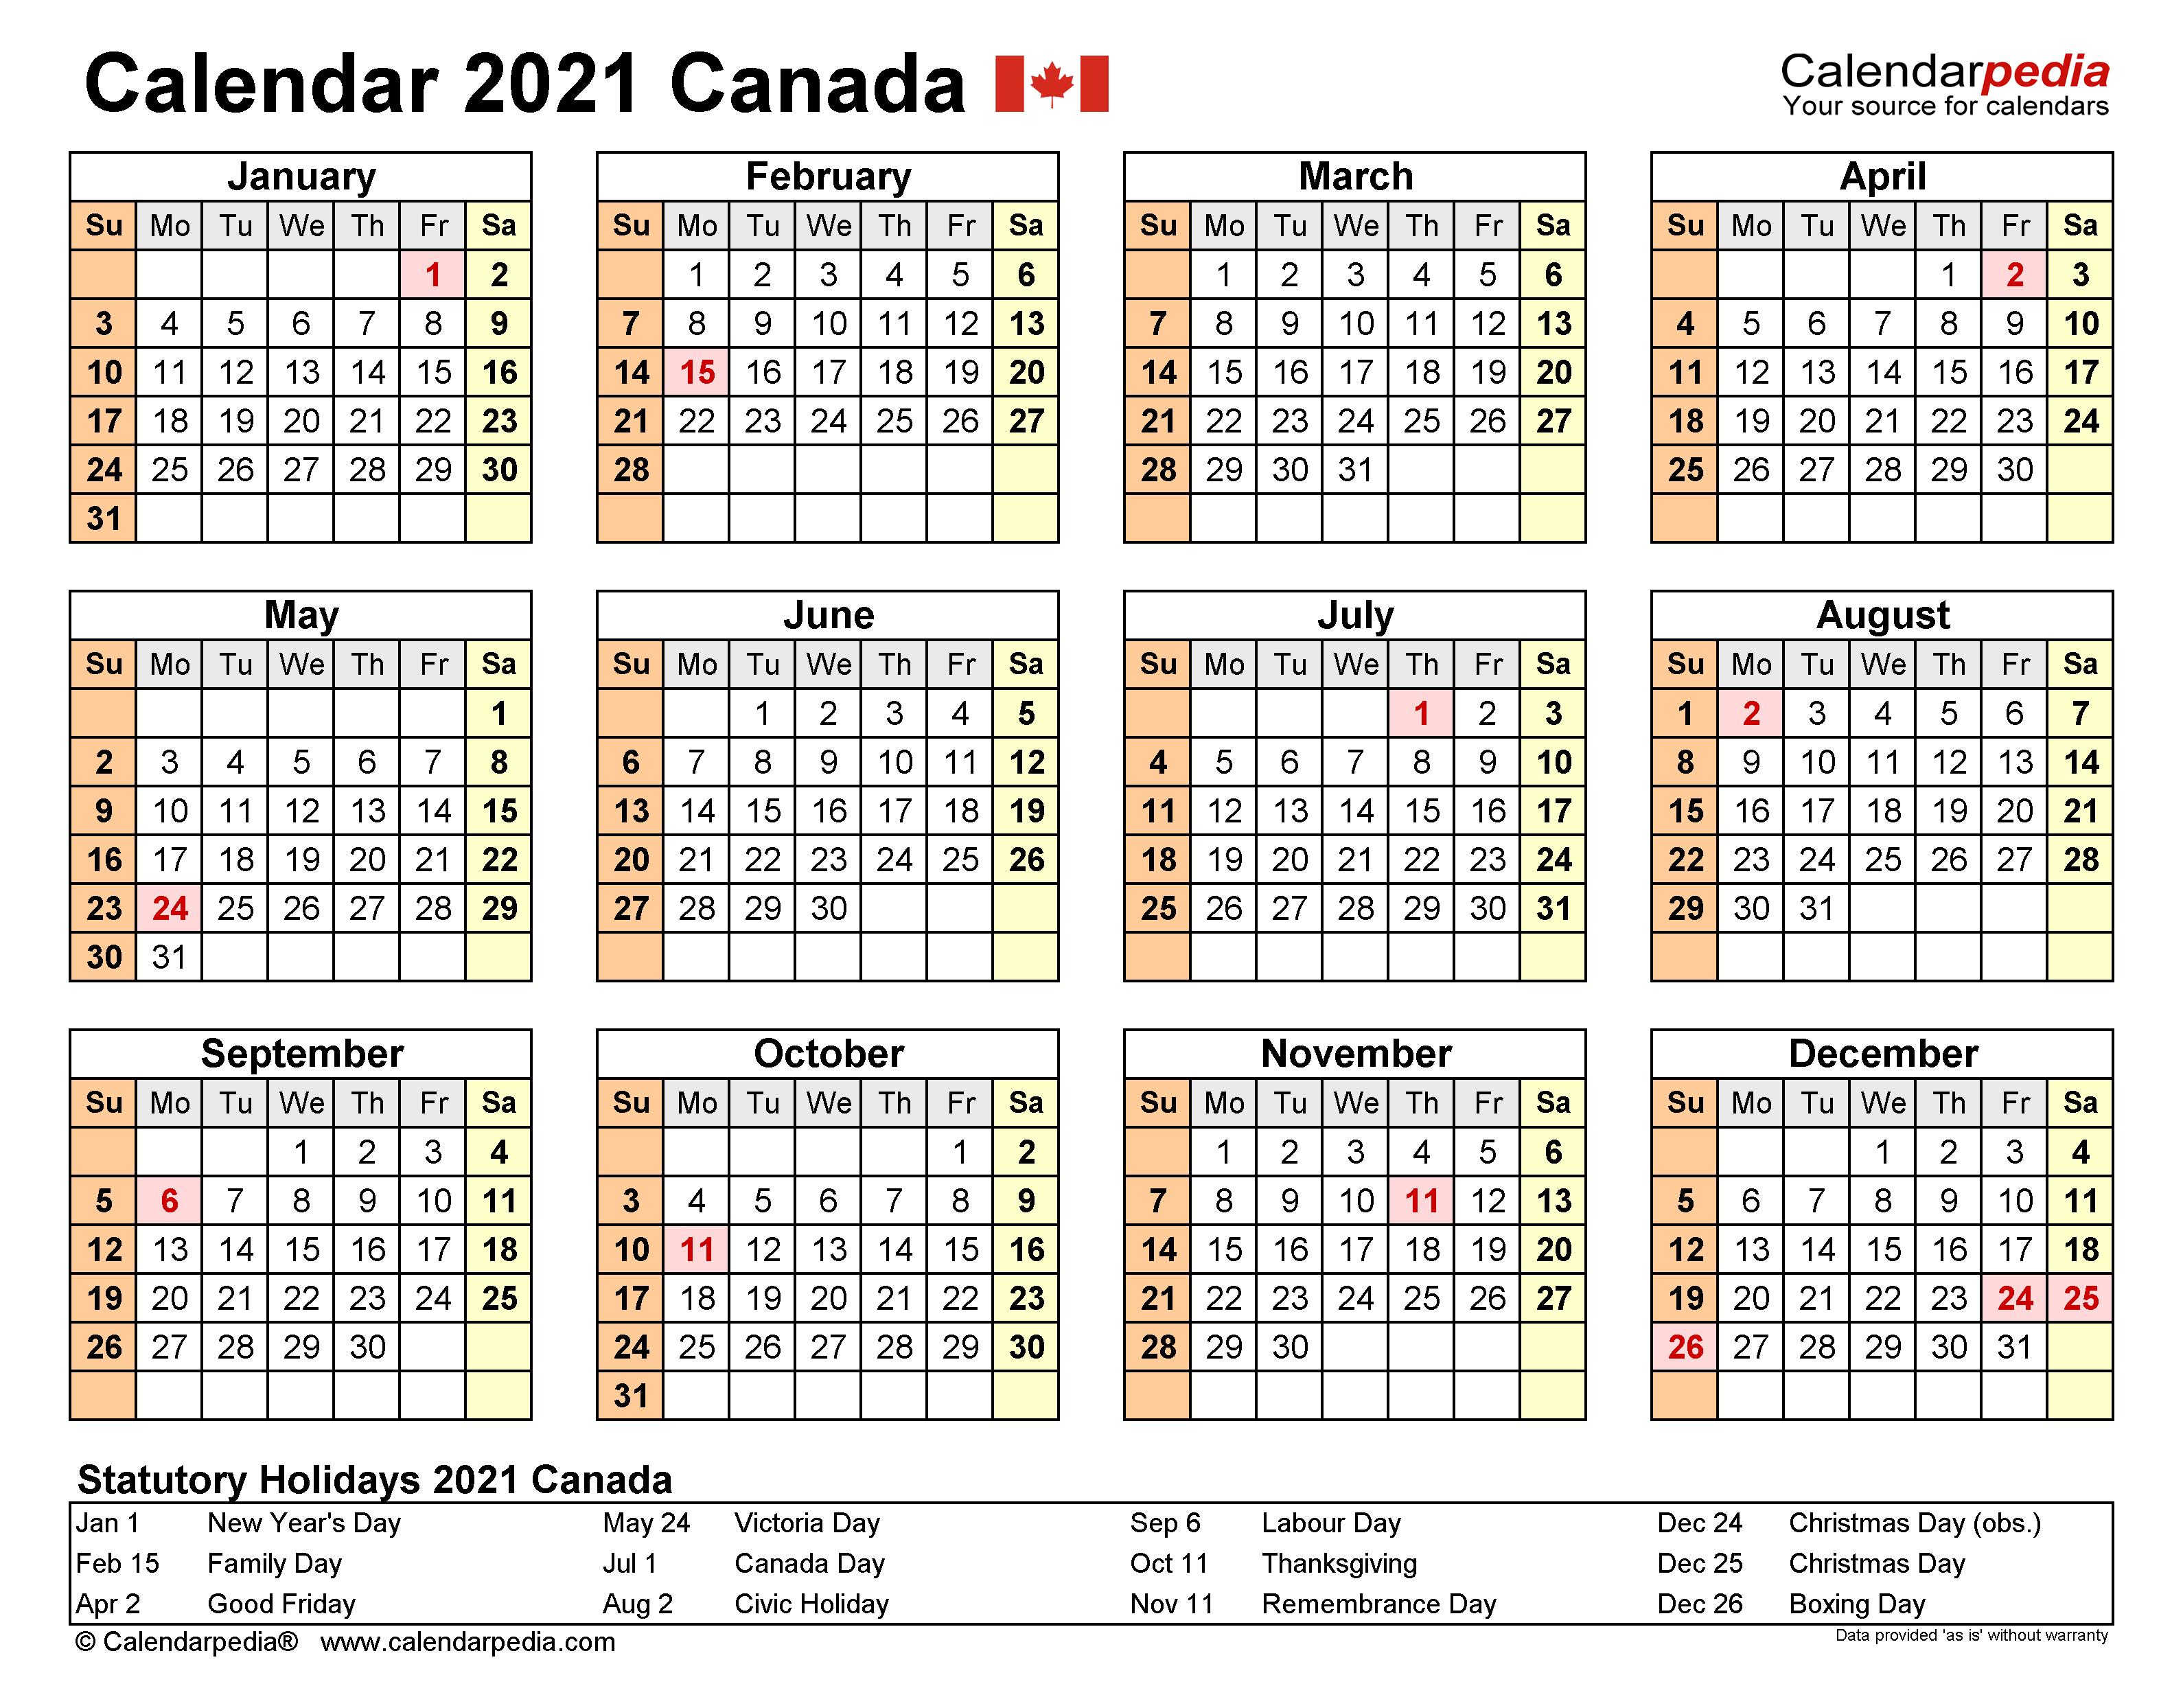 Canada Holiday Calendar 2021 - Holiday Calendar intended for Uri Academic Calendar 2022